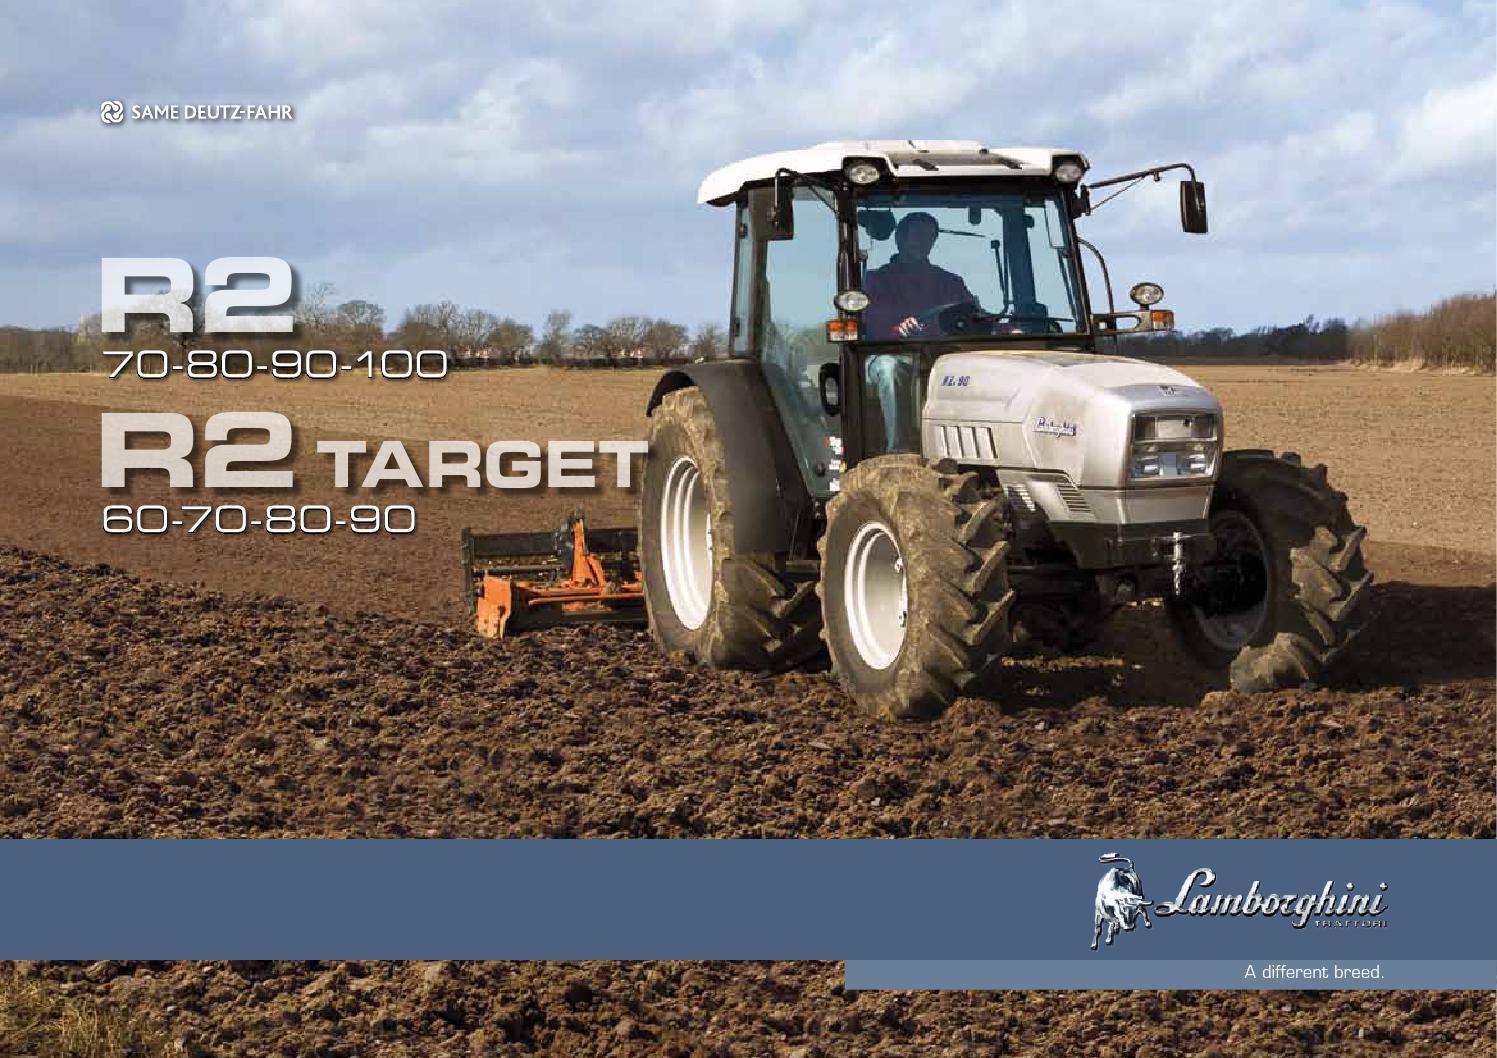 R2 Target Brochure Pt By Lamborghini Trattori Issuu Tractor Light Wiring 2v